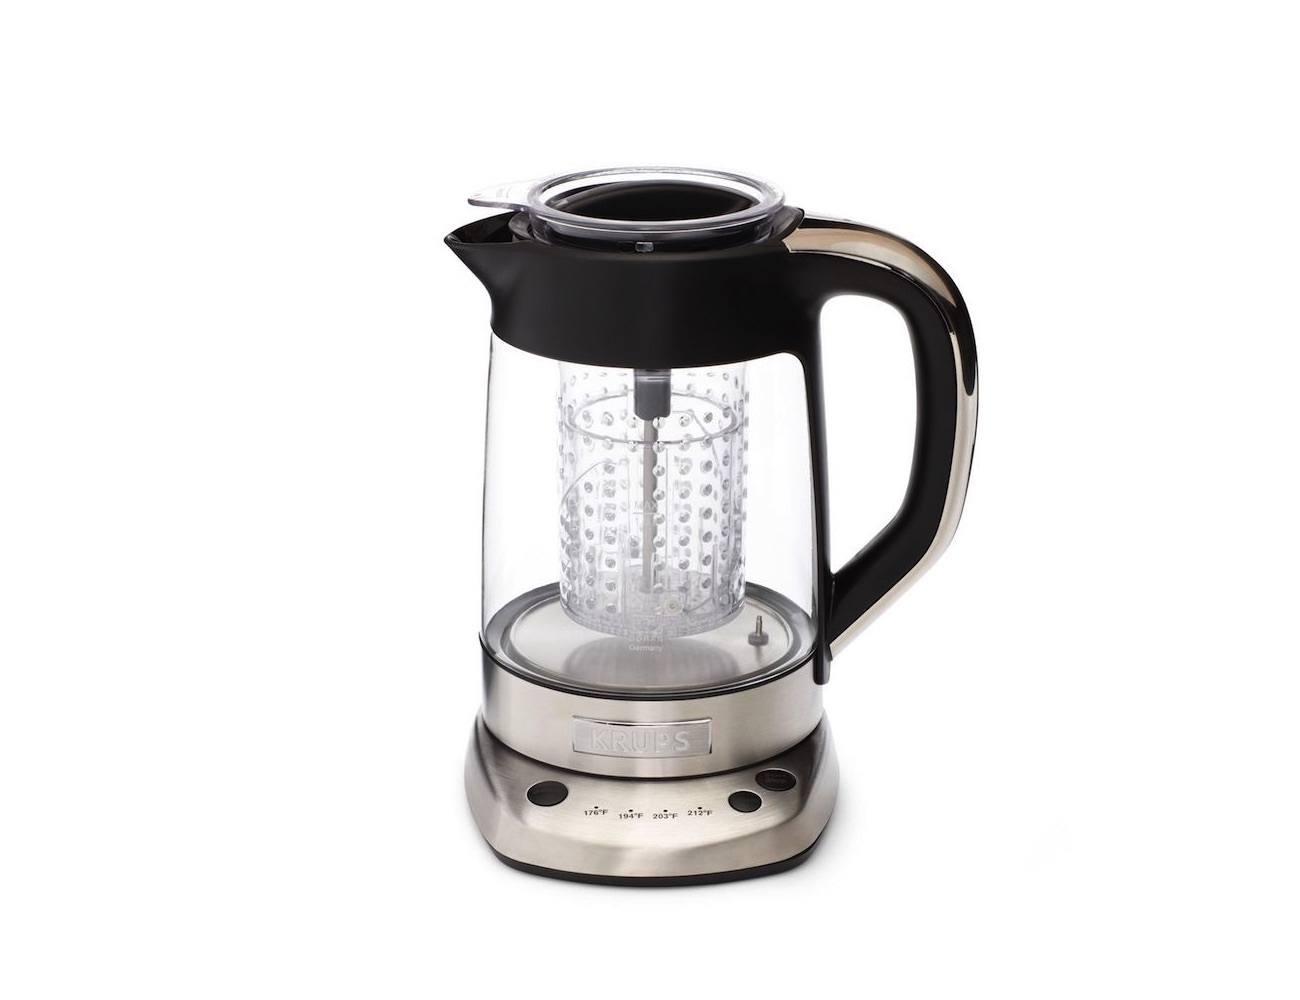 Krups Electric Glass Kettle Tea Infuser